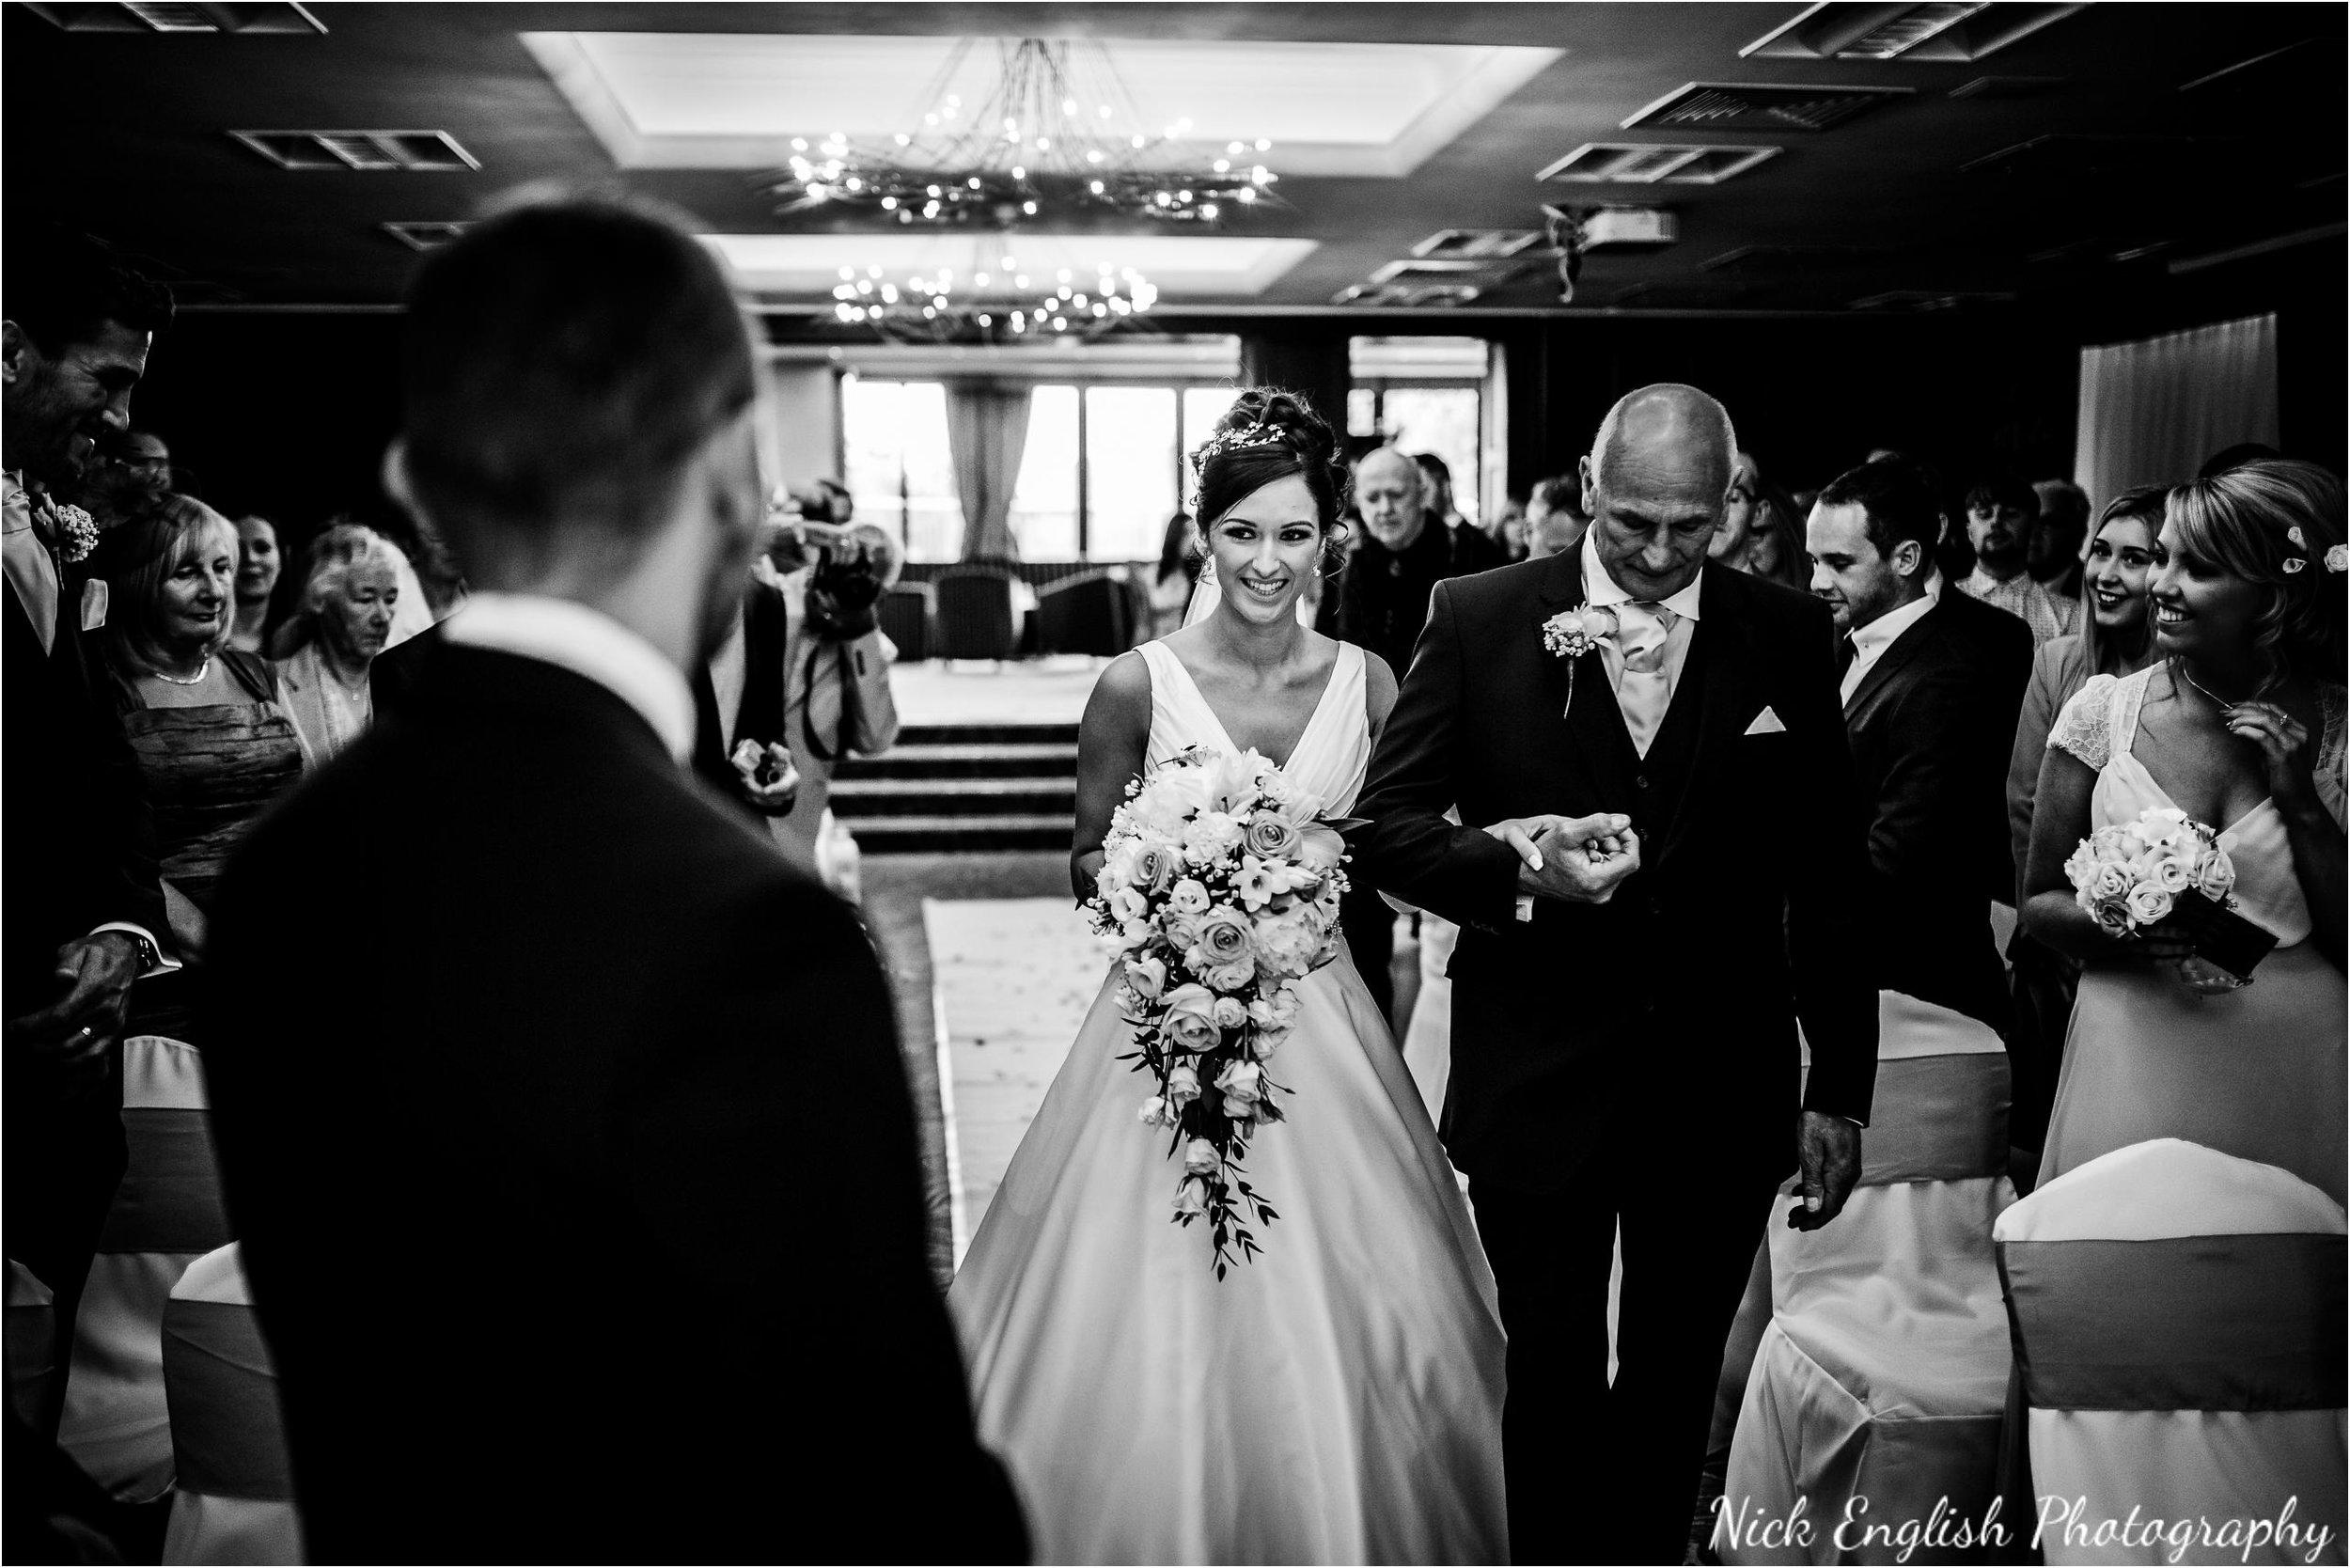 Emily David Wedding Photographs at Barton Grange Preston by Nick English Photography 59jpg.jpeg